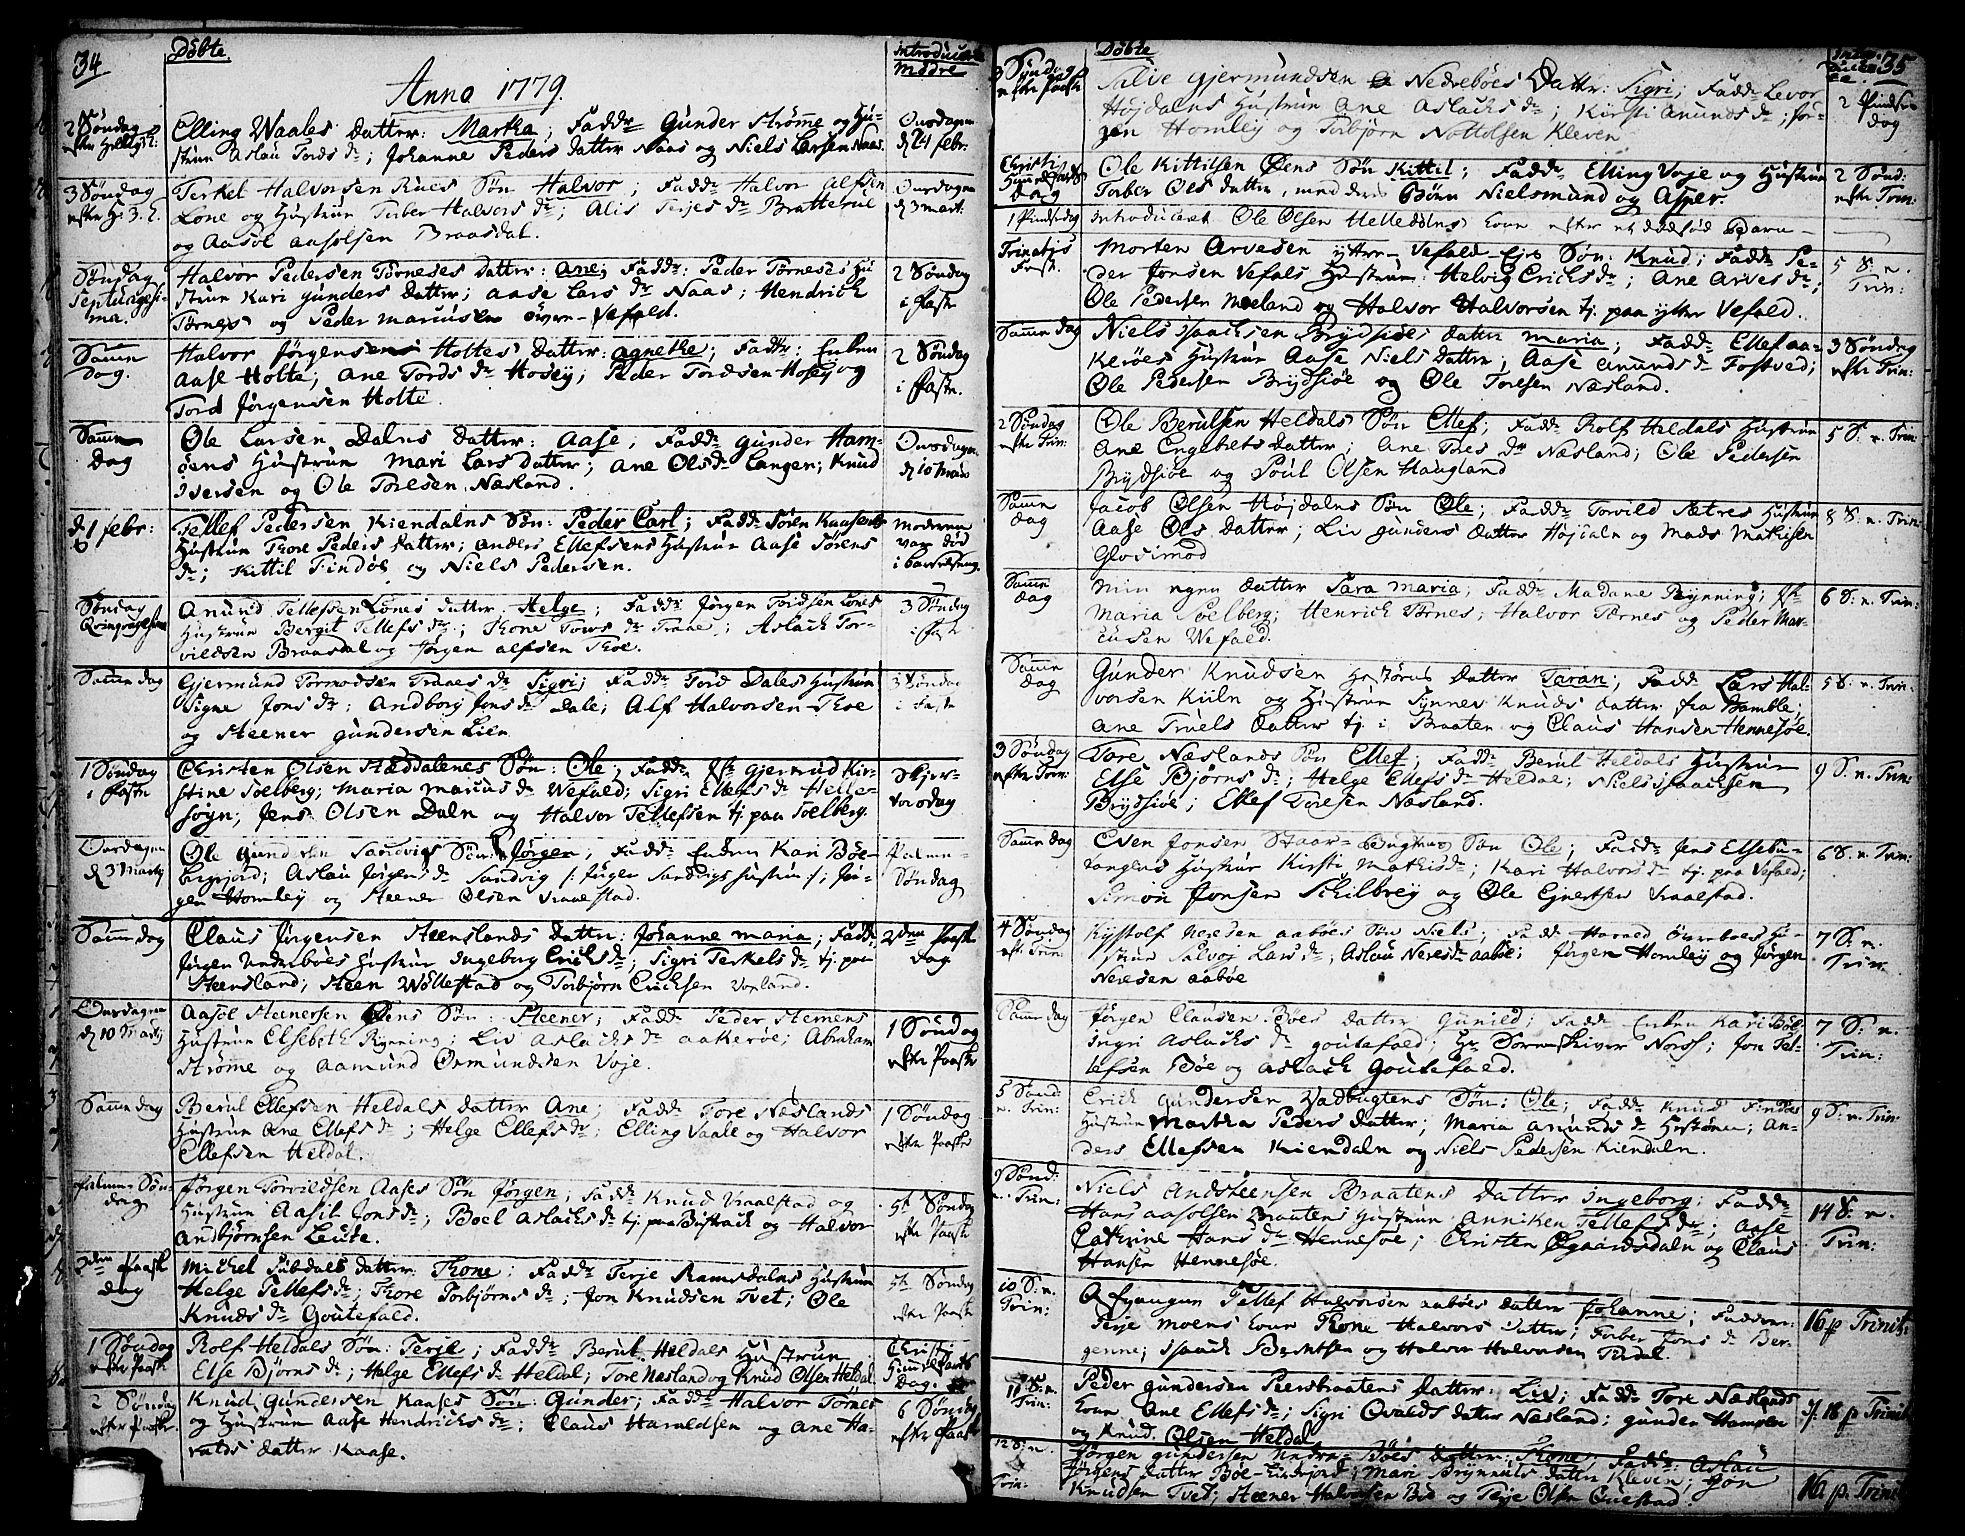 SAKO, Drangedal kirkebøker, F/Fa/L0003: Ministerialbok nr. 3, 1768-1814, s. 34-35